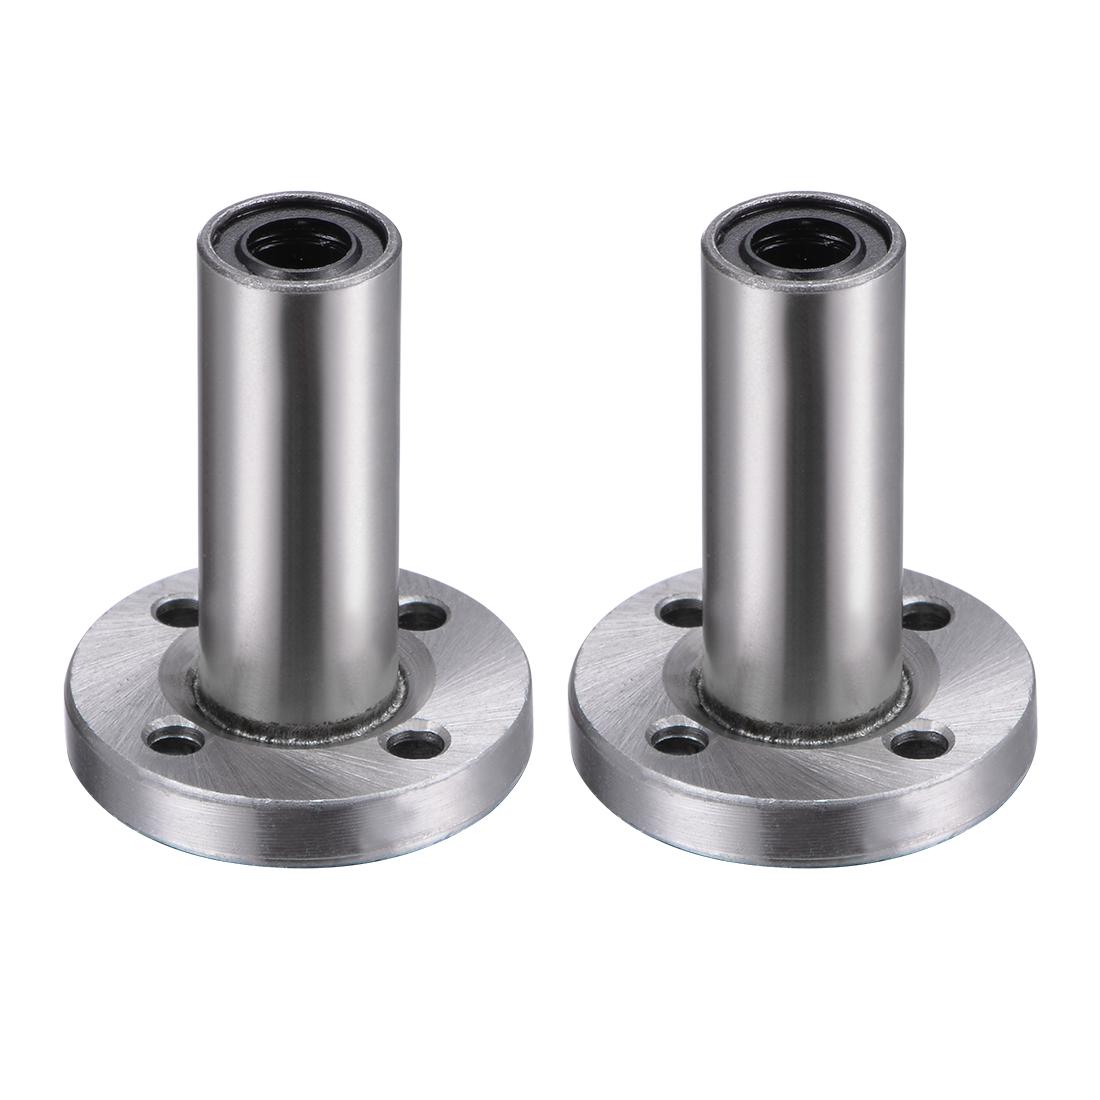 6mm Linear Ball Bearings Round Flange LMF6LUU 6mm Bore 12mm OD 35mm Length 2pcs